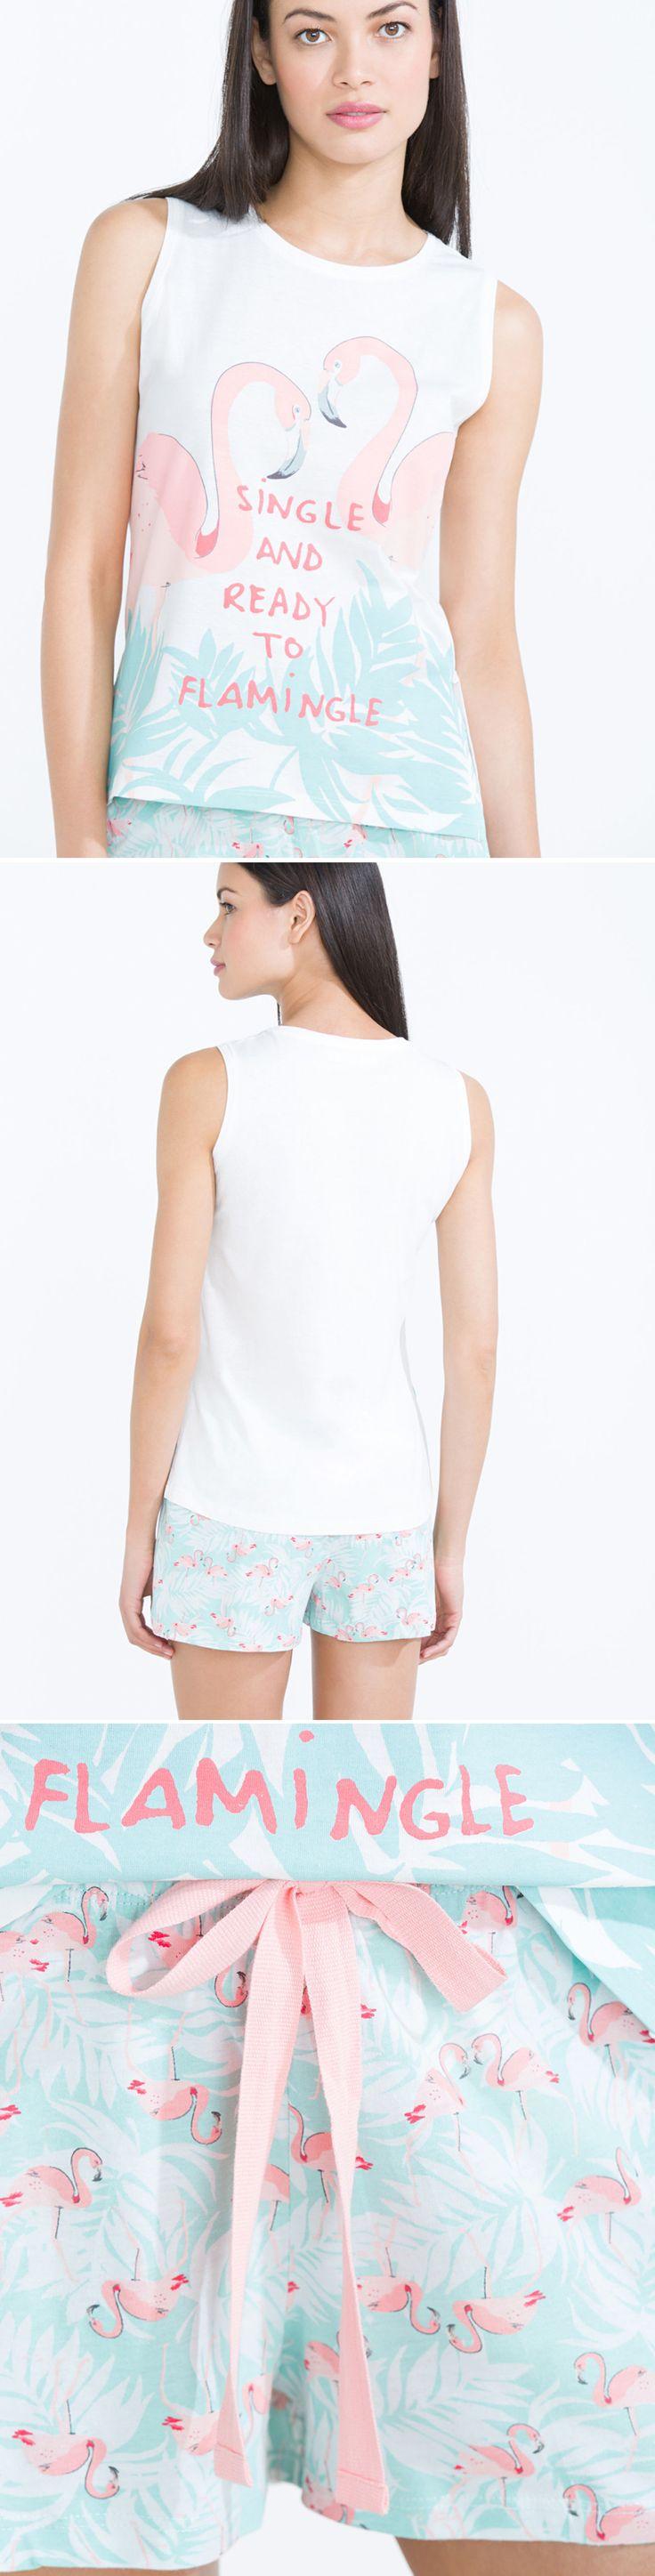 @womensecret Single and ready to flamingo' short pyjama